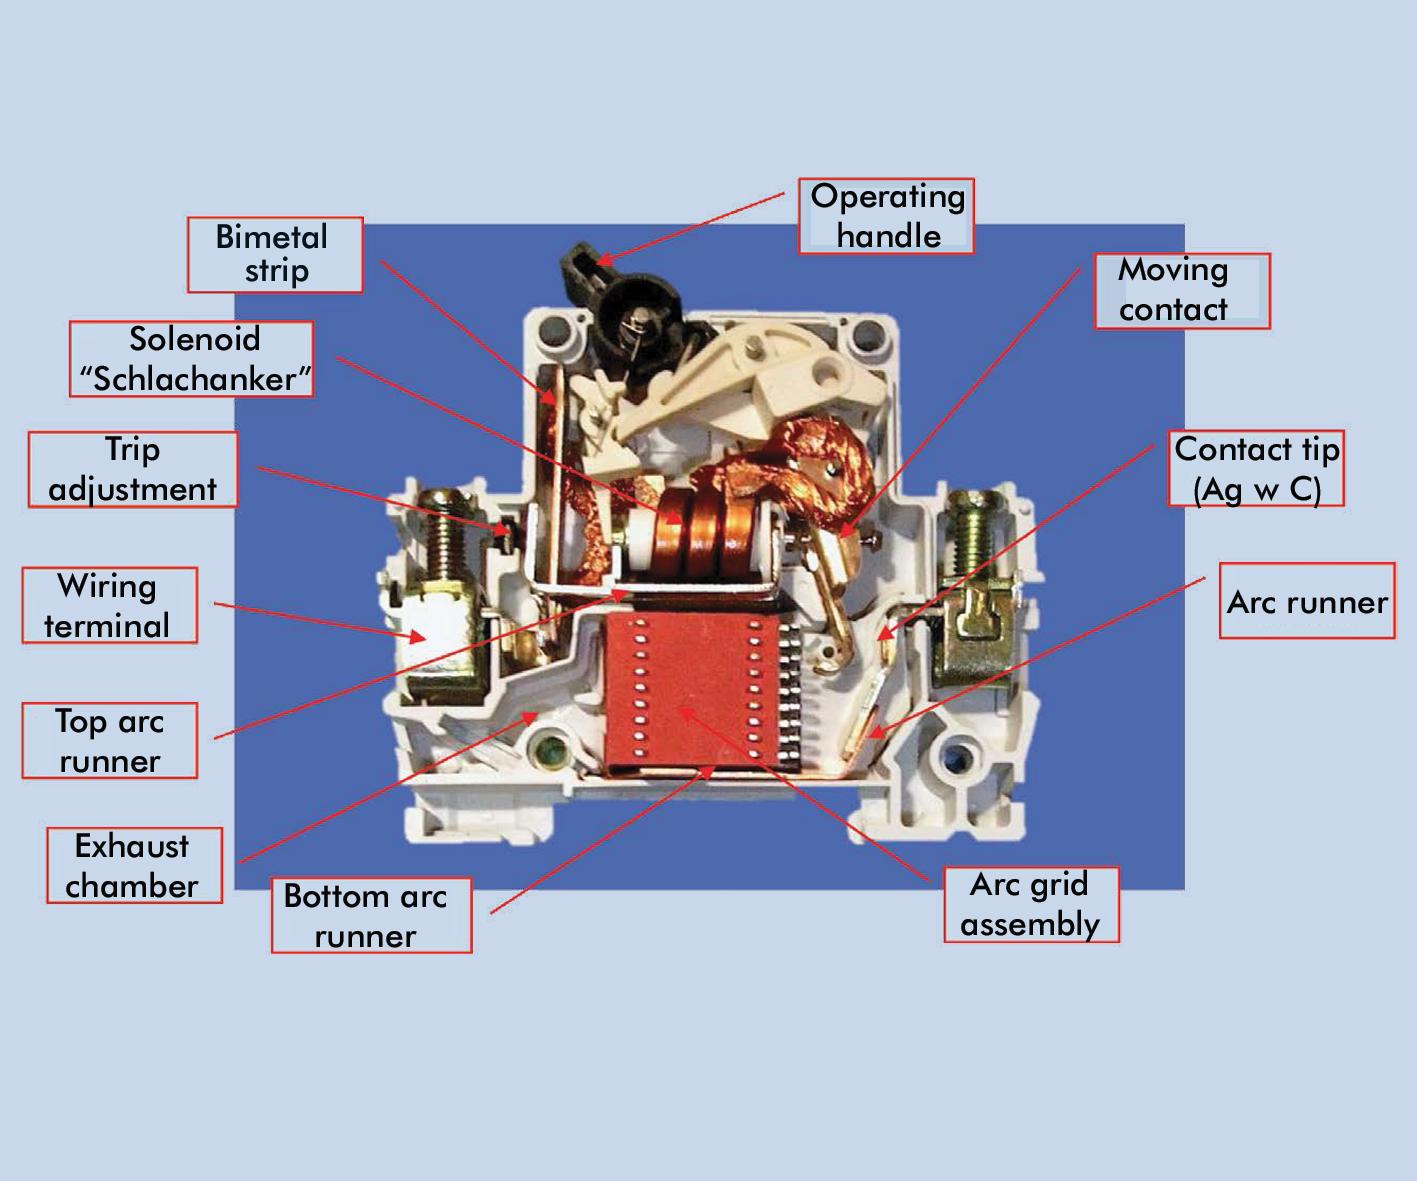 Stupendous A Guide To Miniature Circuit Breakers Ee Publishers Wiring Cloud Cranvenetmohammedshrineorg